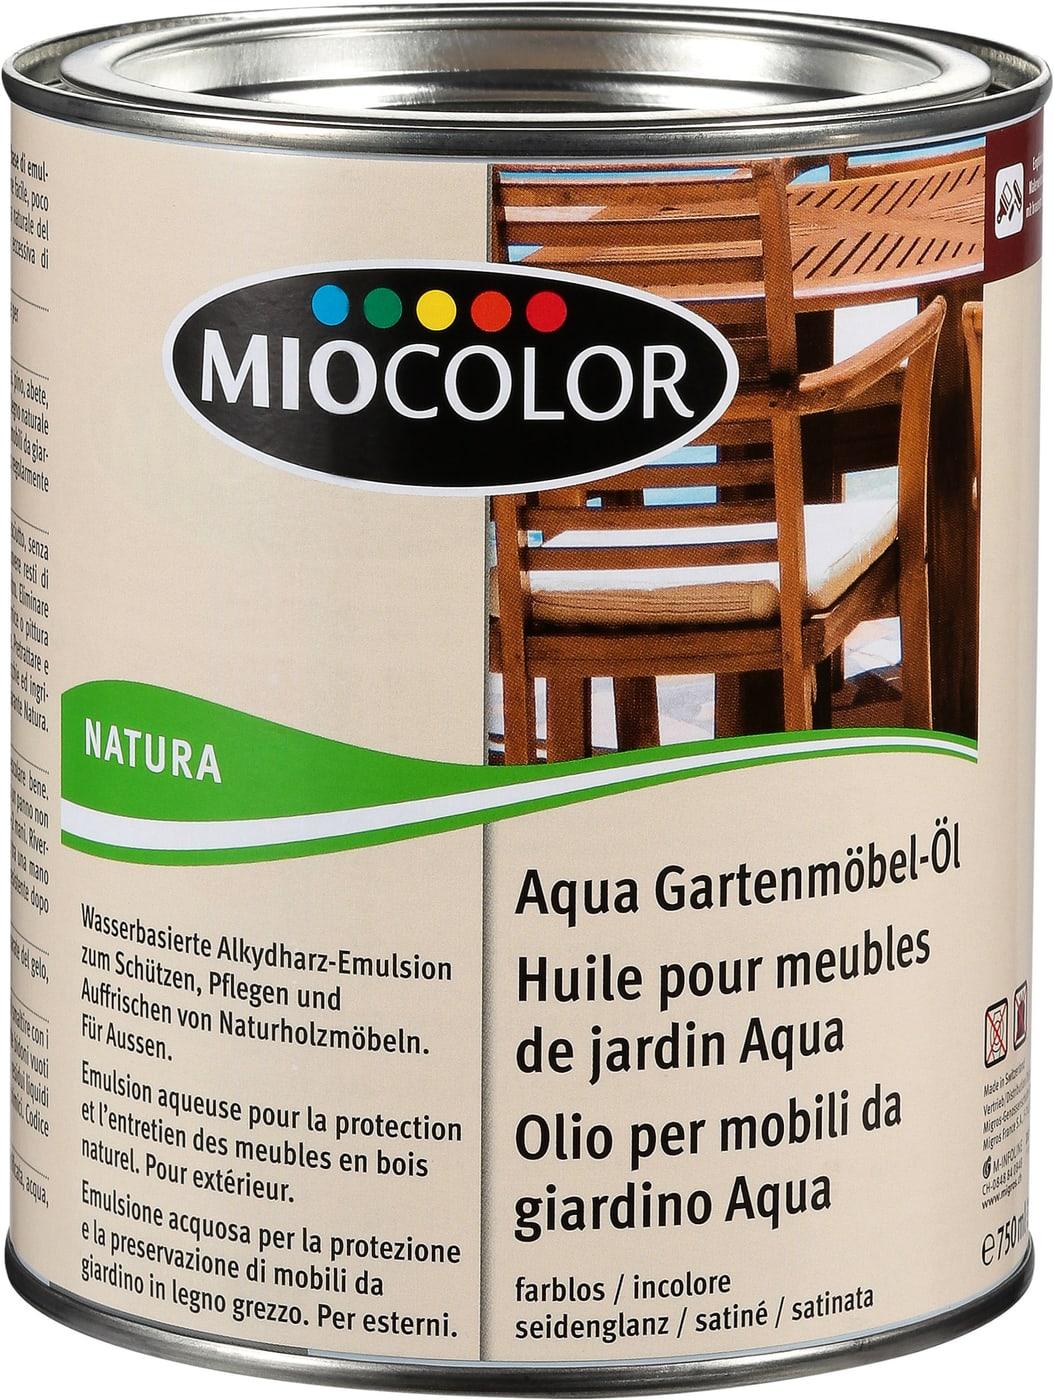 Miocolor Aqua Huile Meubles De Jardin Incolore 750 Ml Migros